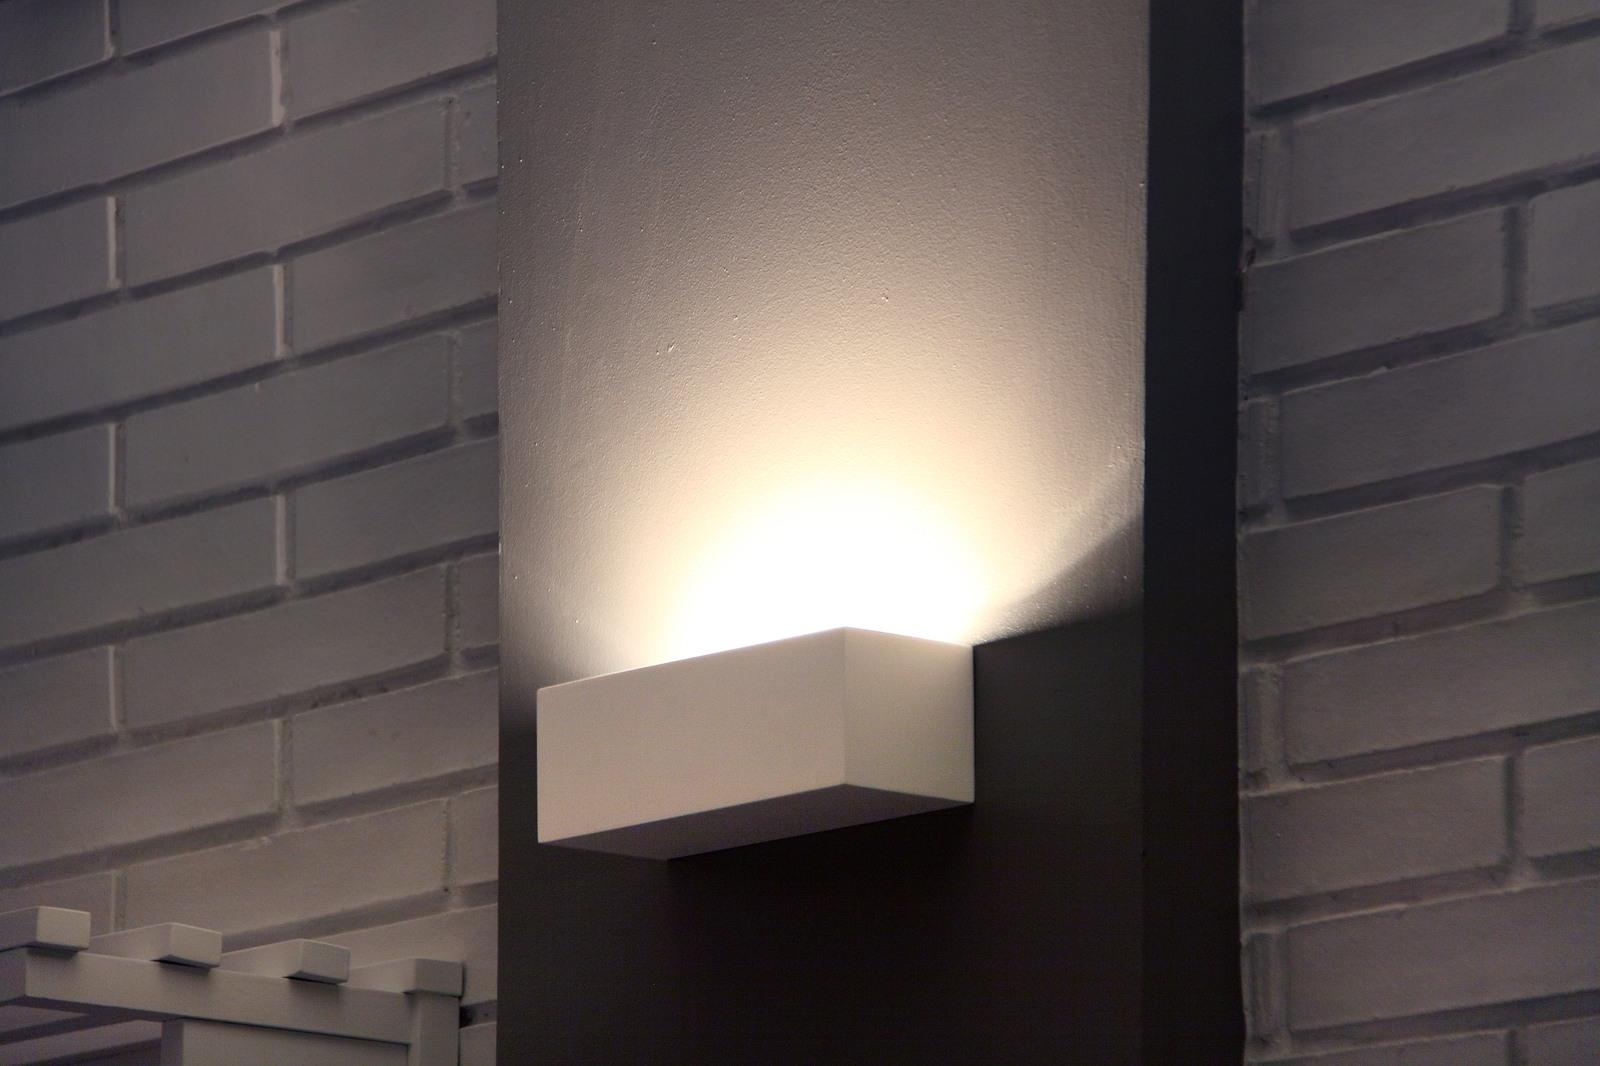 Plafoniere Da Parete Alternative : Eaco lampada da parete bianca una luce g w faro lorefar art